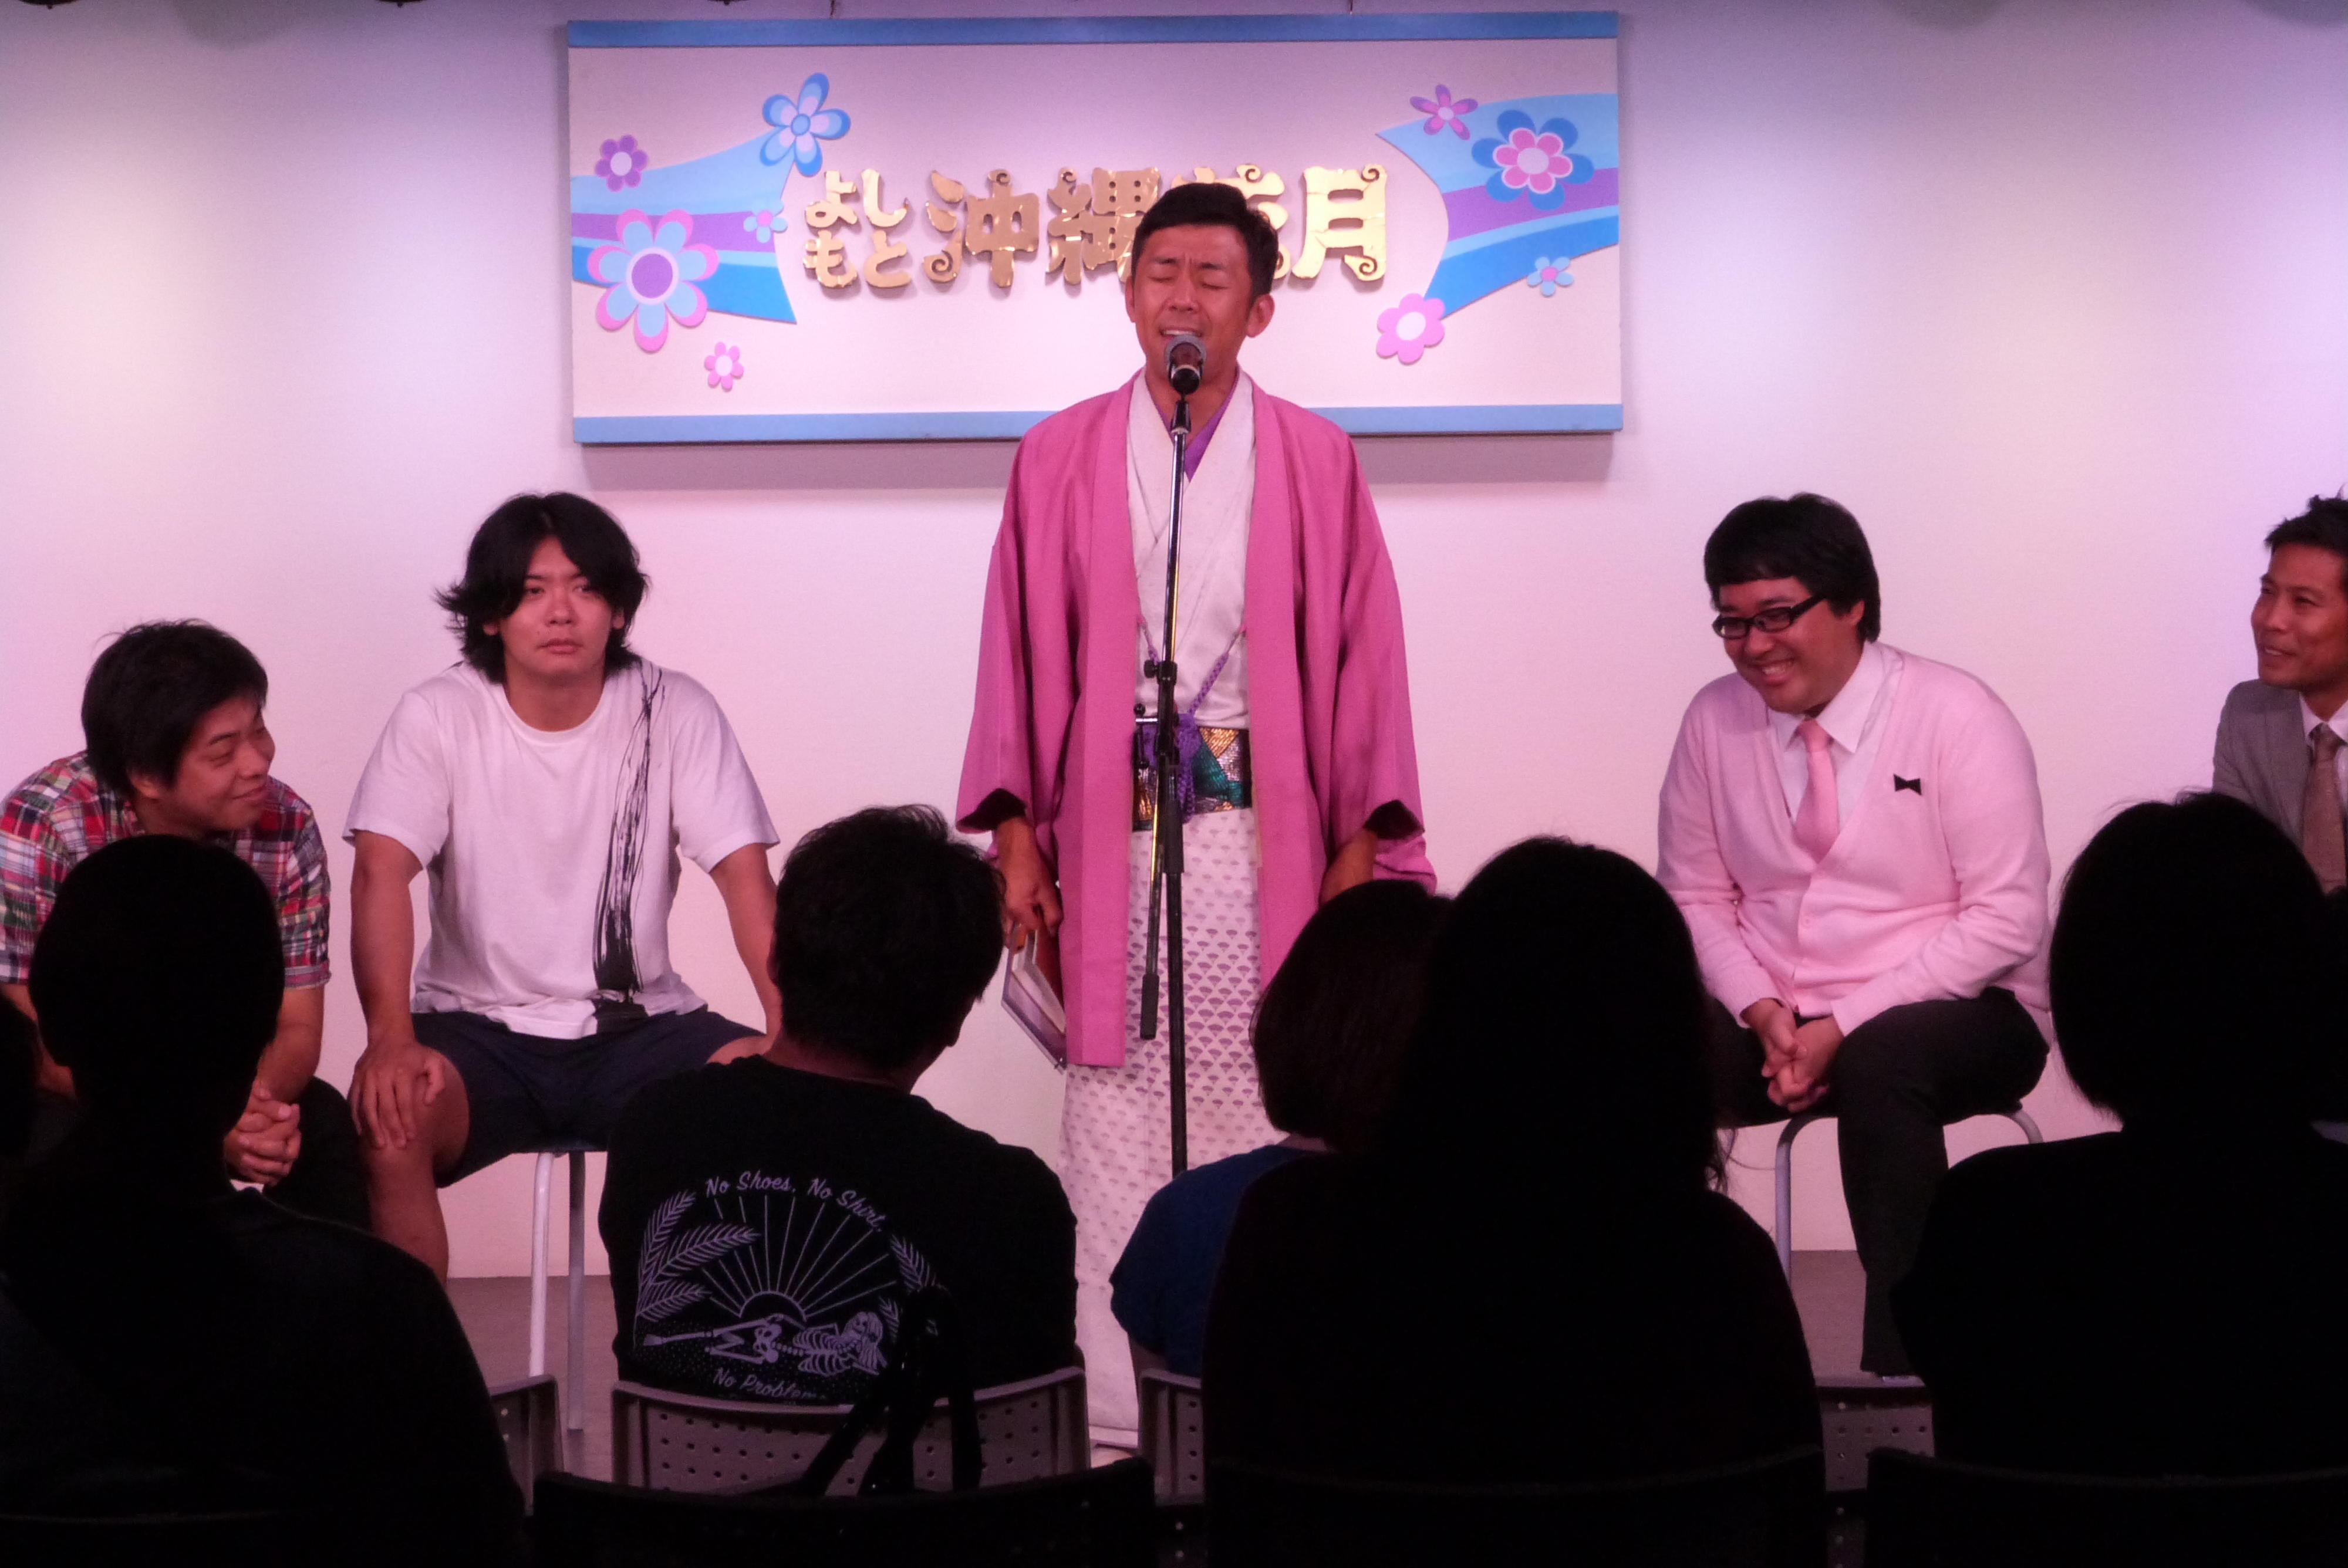 http://news.yoshimoto.co.jp/20180822204028-18ddabce3ff74812a13a7eb714d48653fa90bf9e.jpg